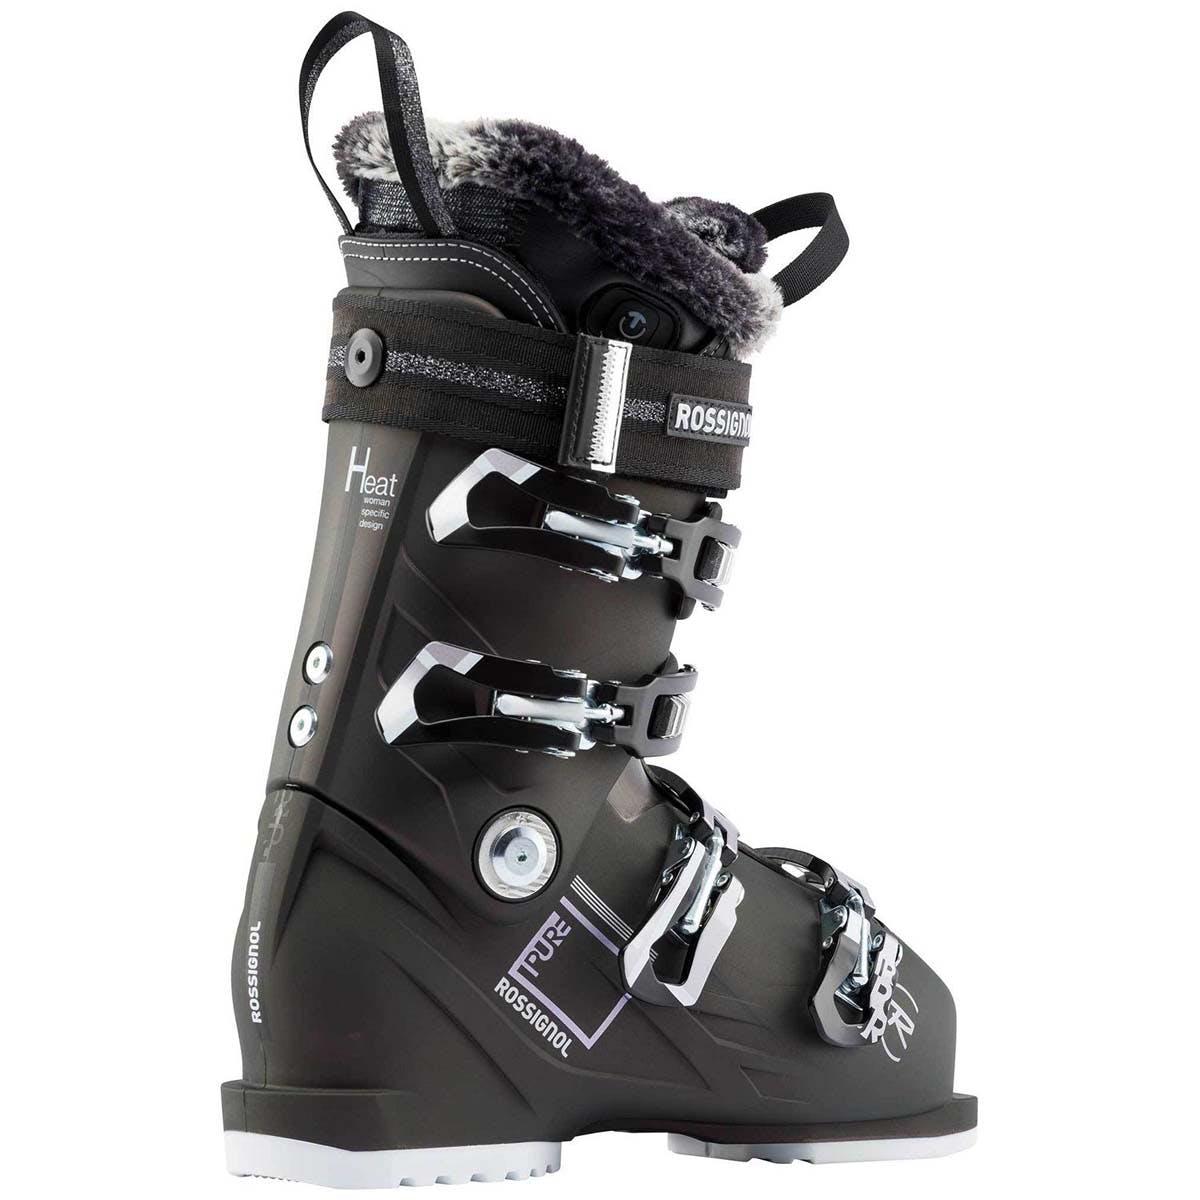 Rossignol Pure Heat Ski Boots · 2022